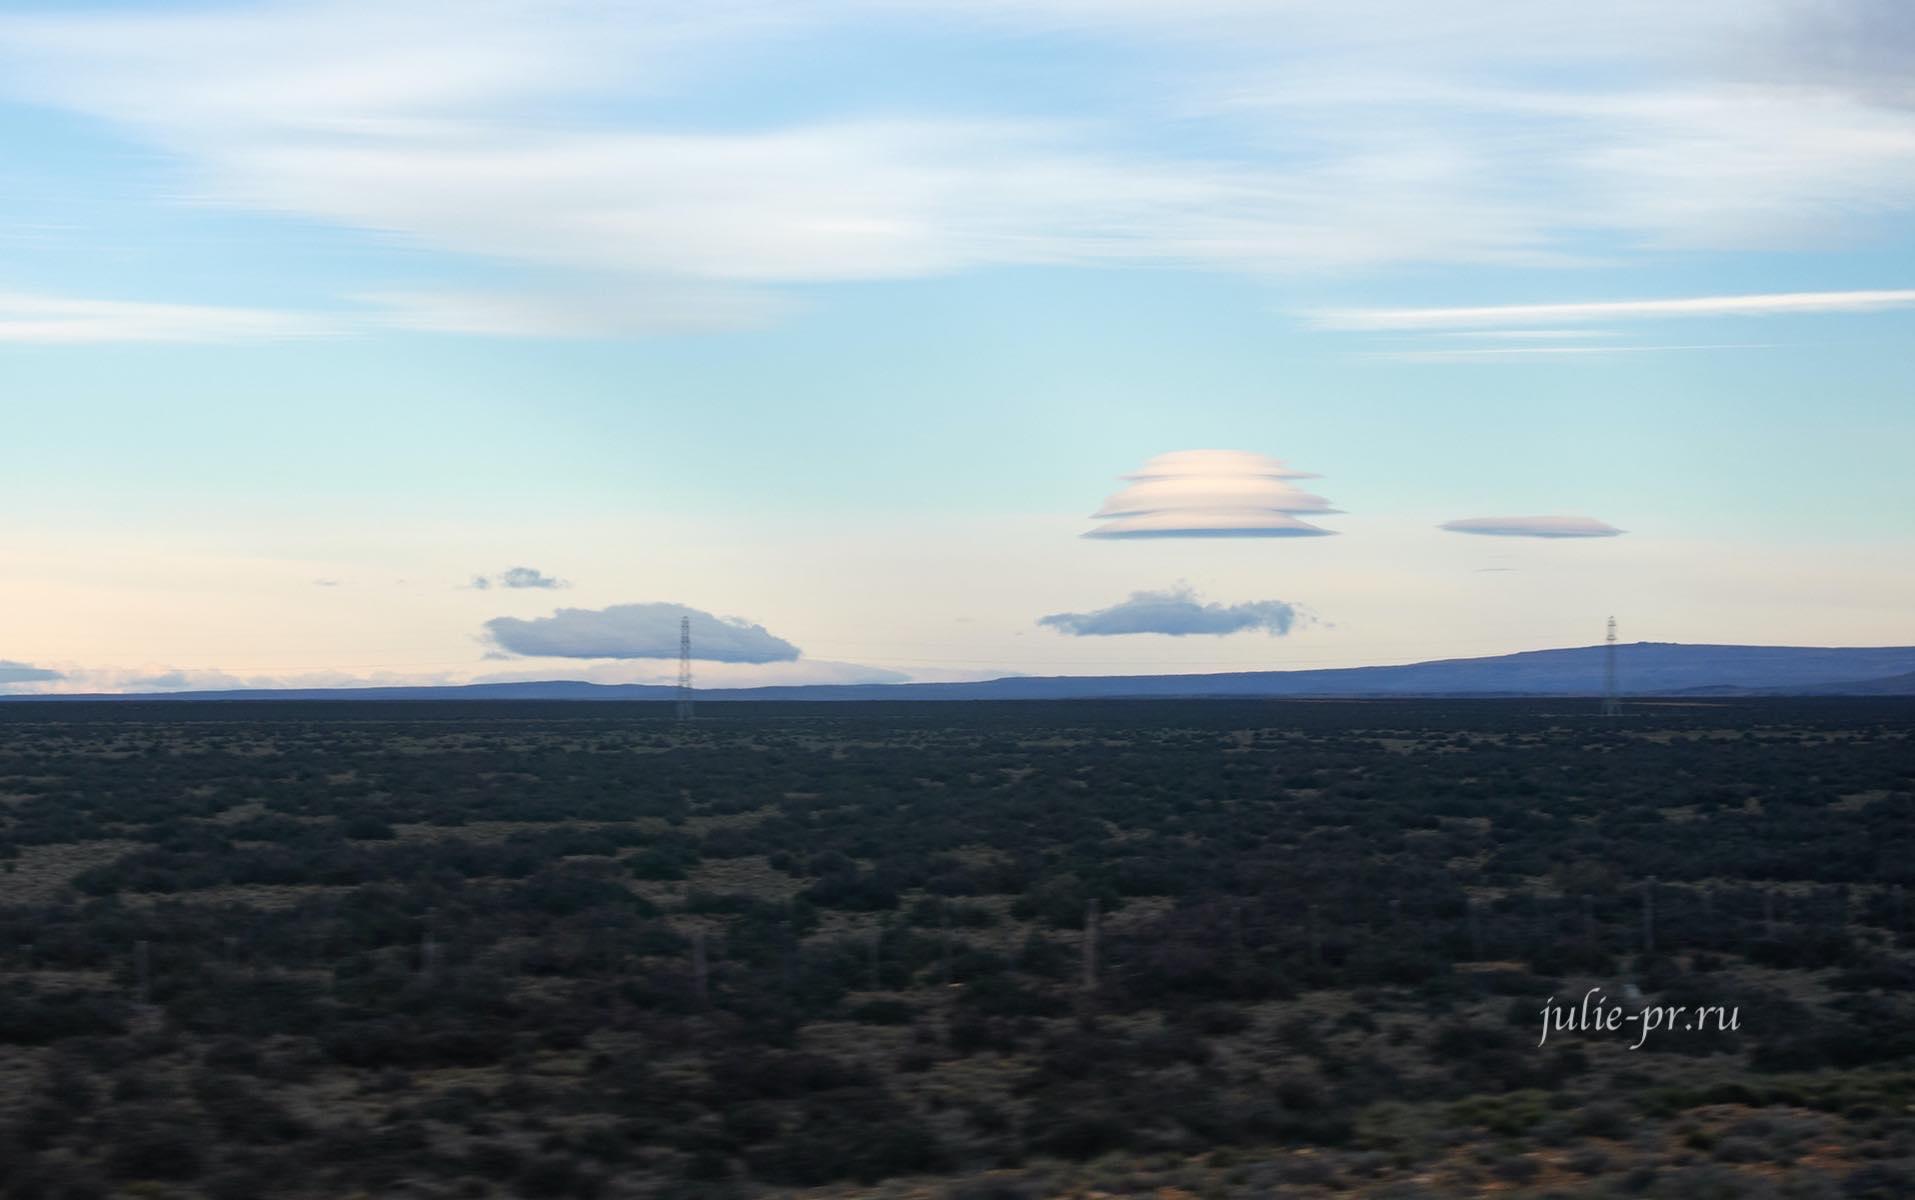 Аргентина, Патагония, Лентикулярное облако